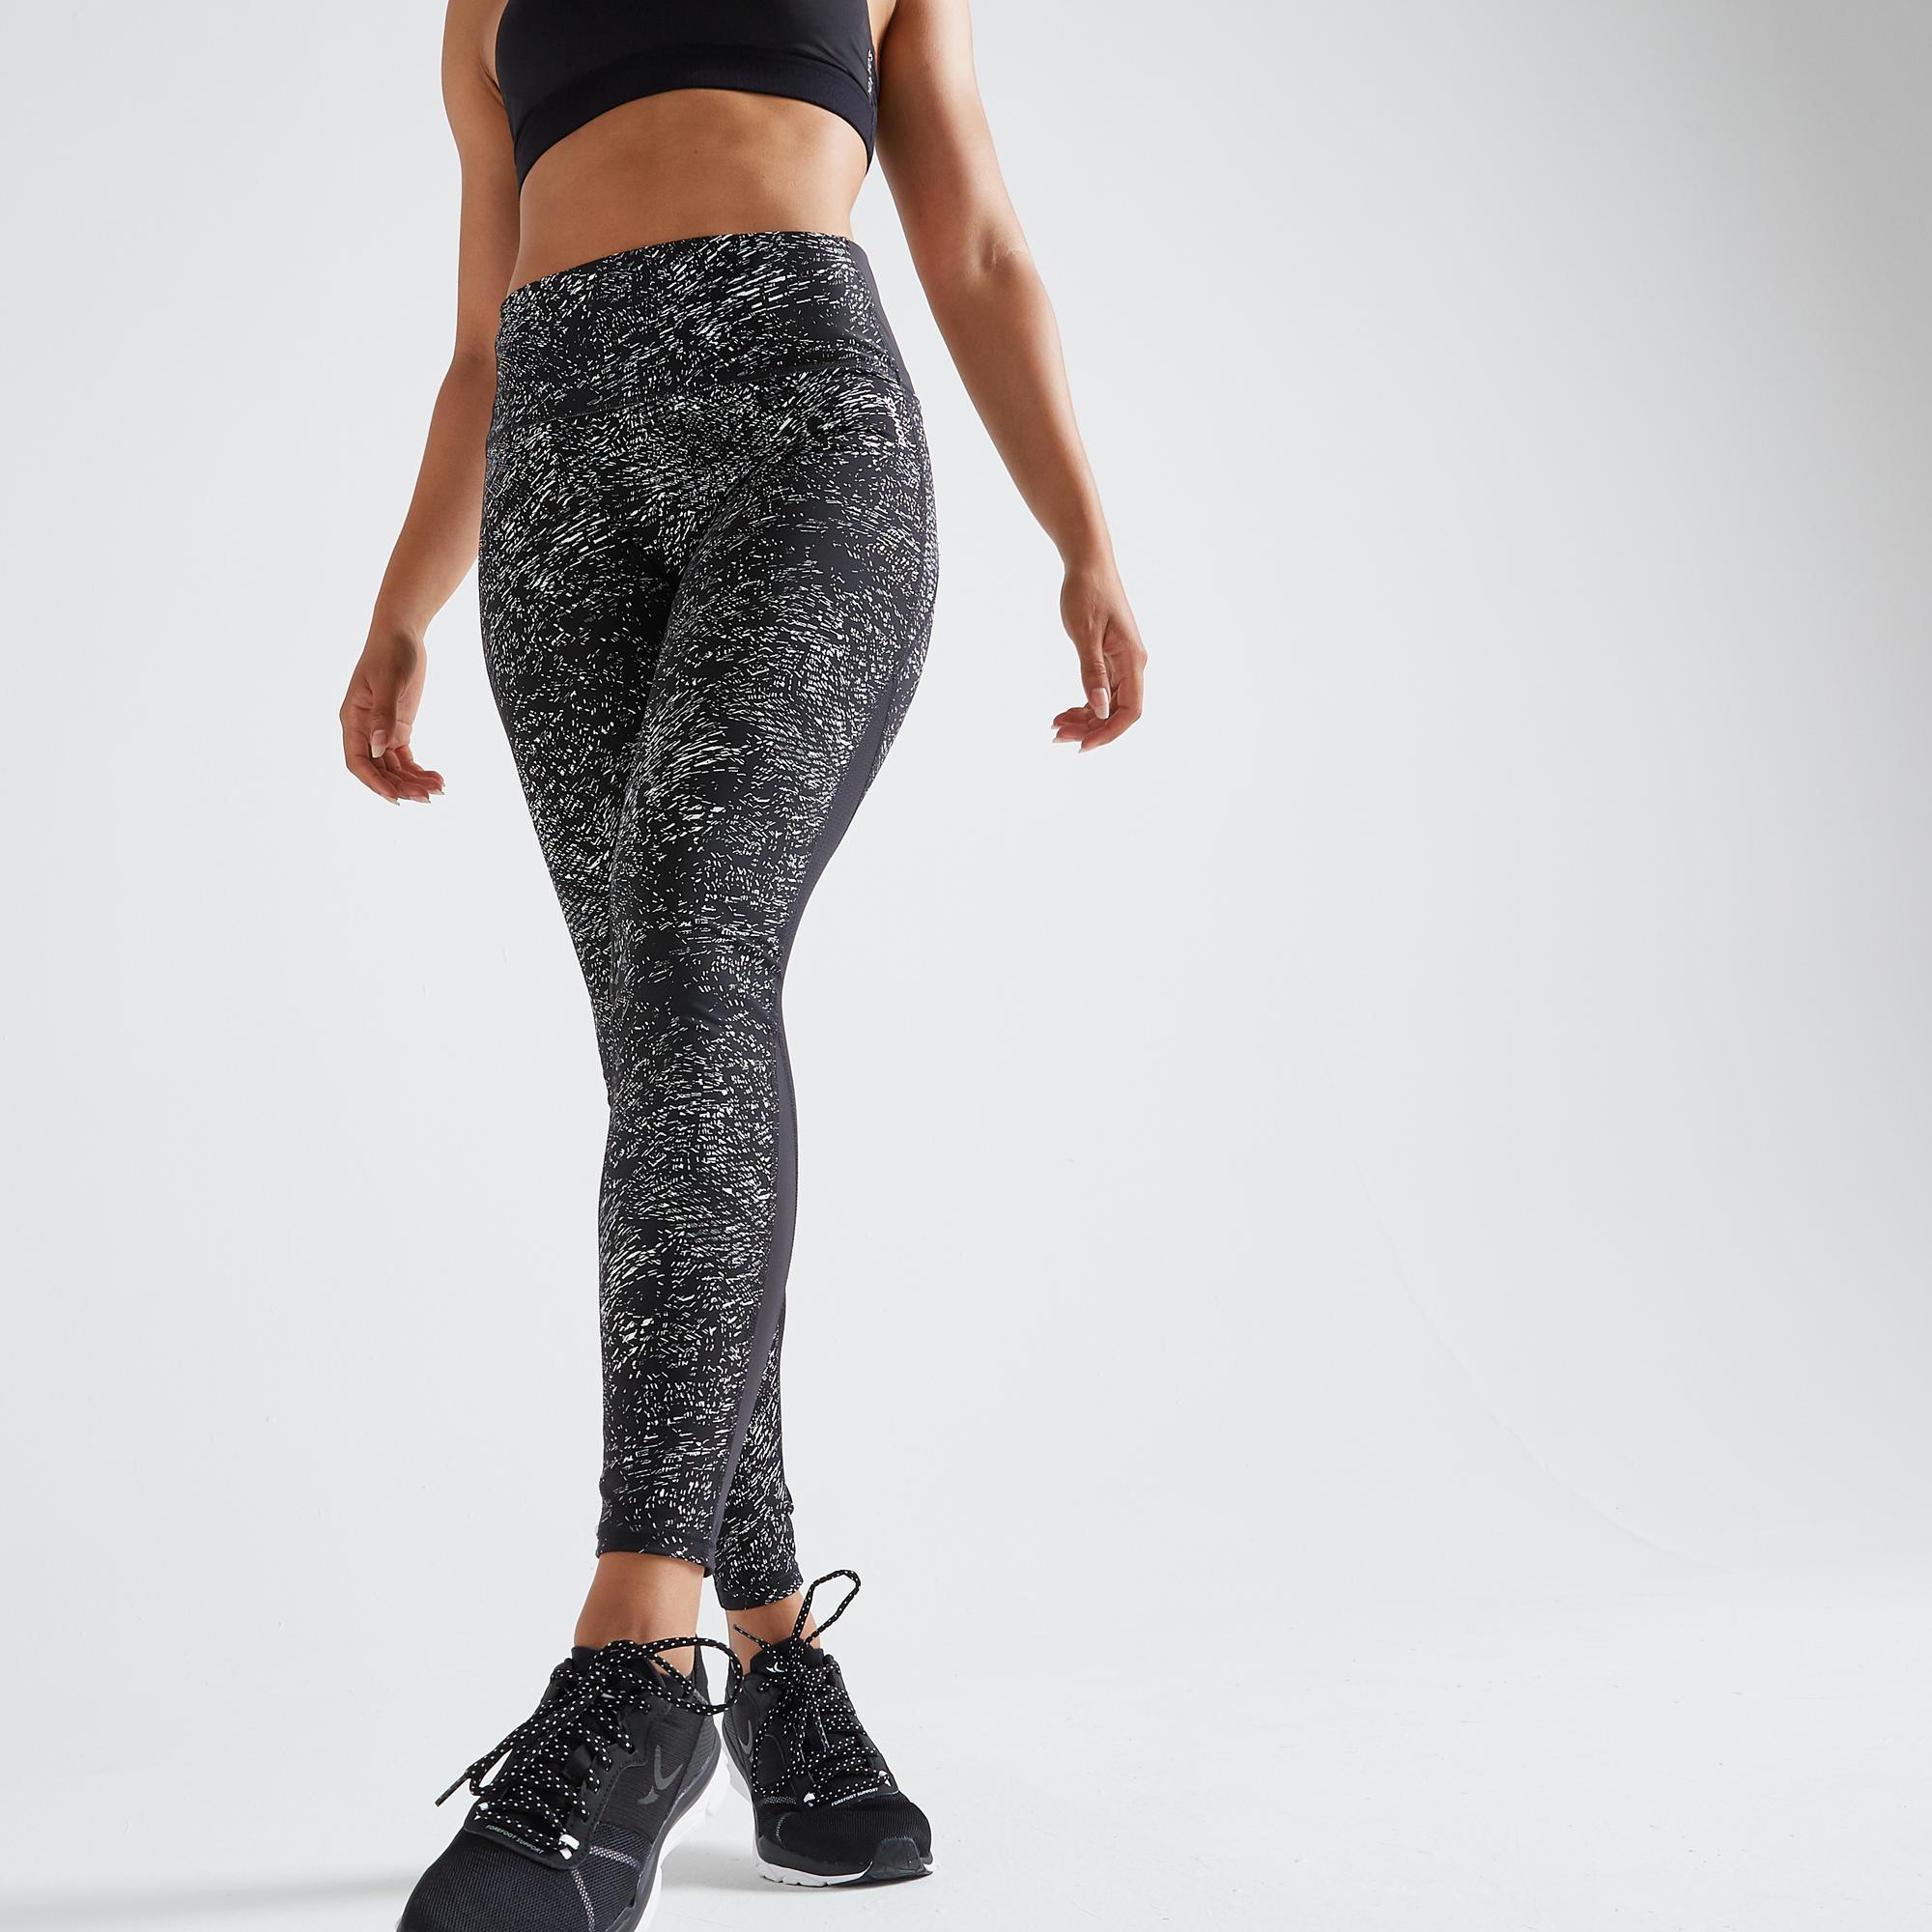 Domyos Legging Voor Cardiofitness Dames 500 Decathlon Nl